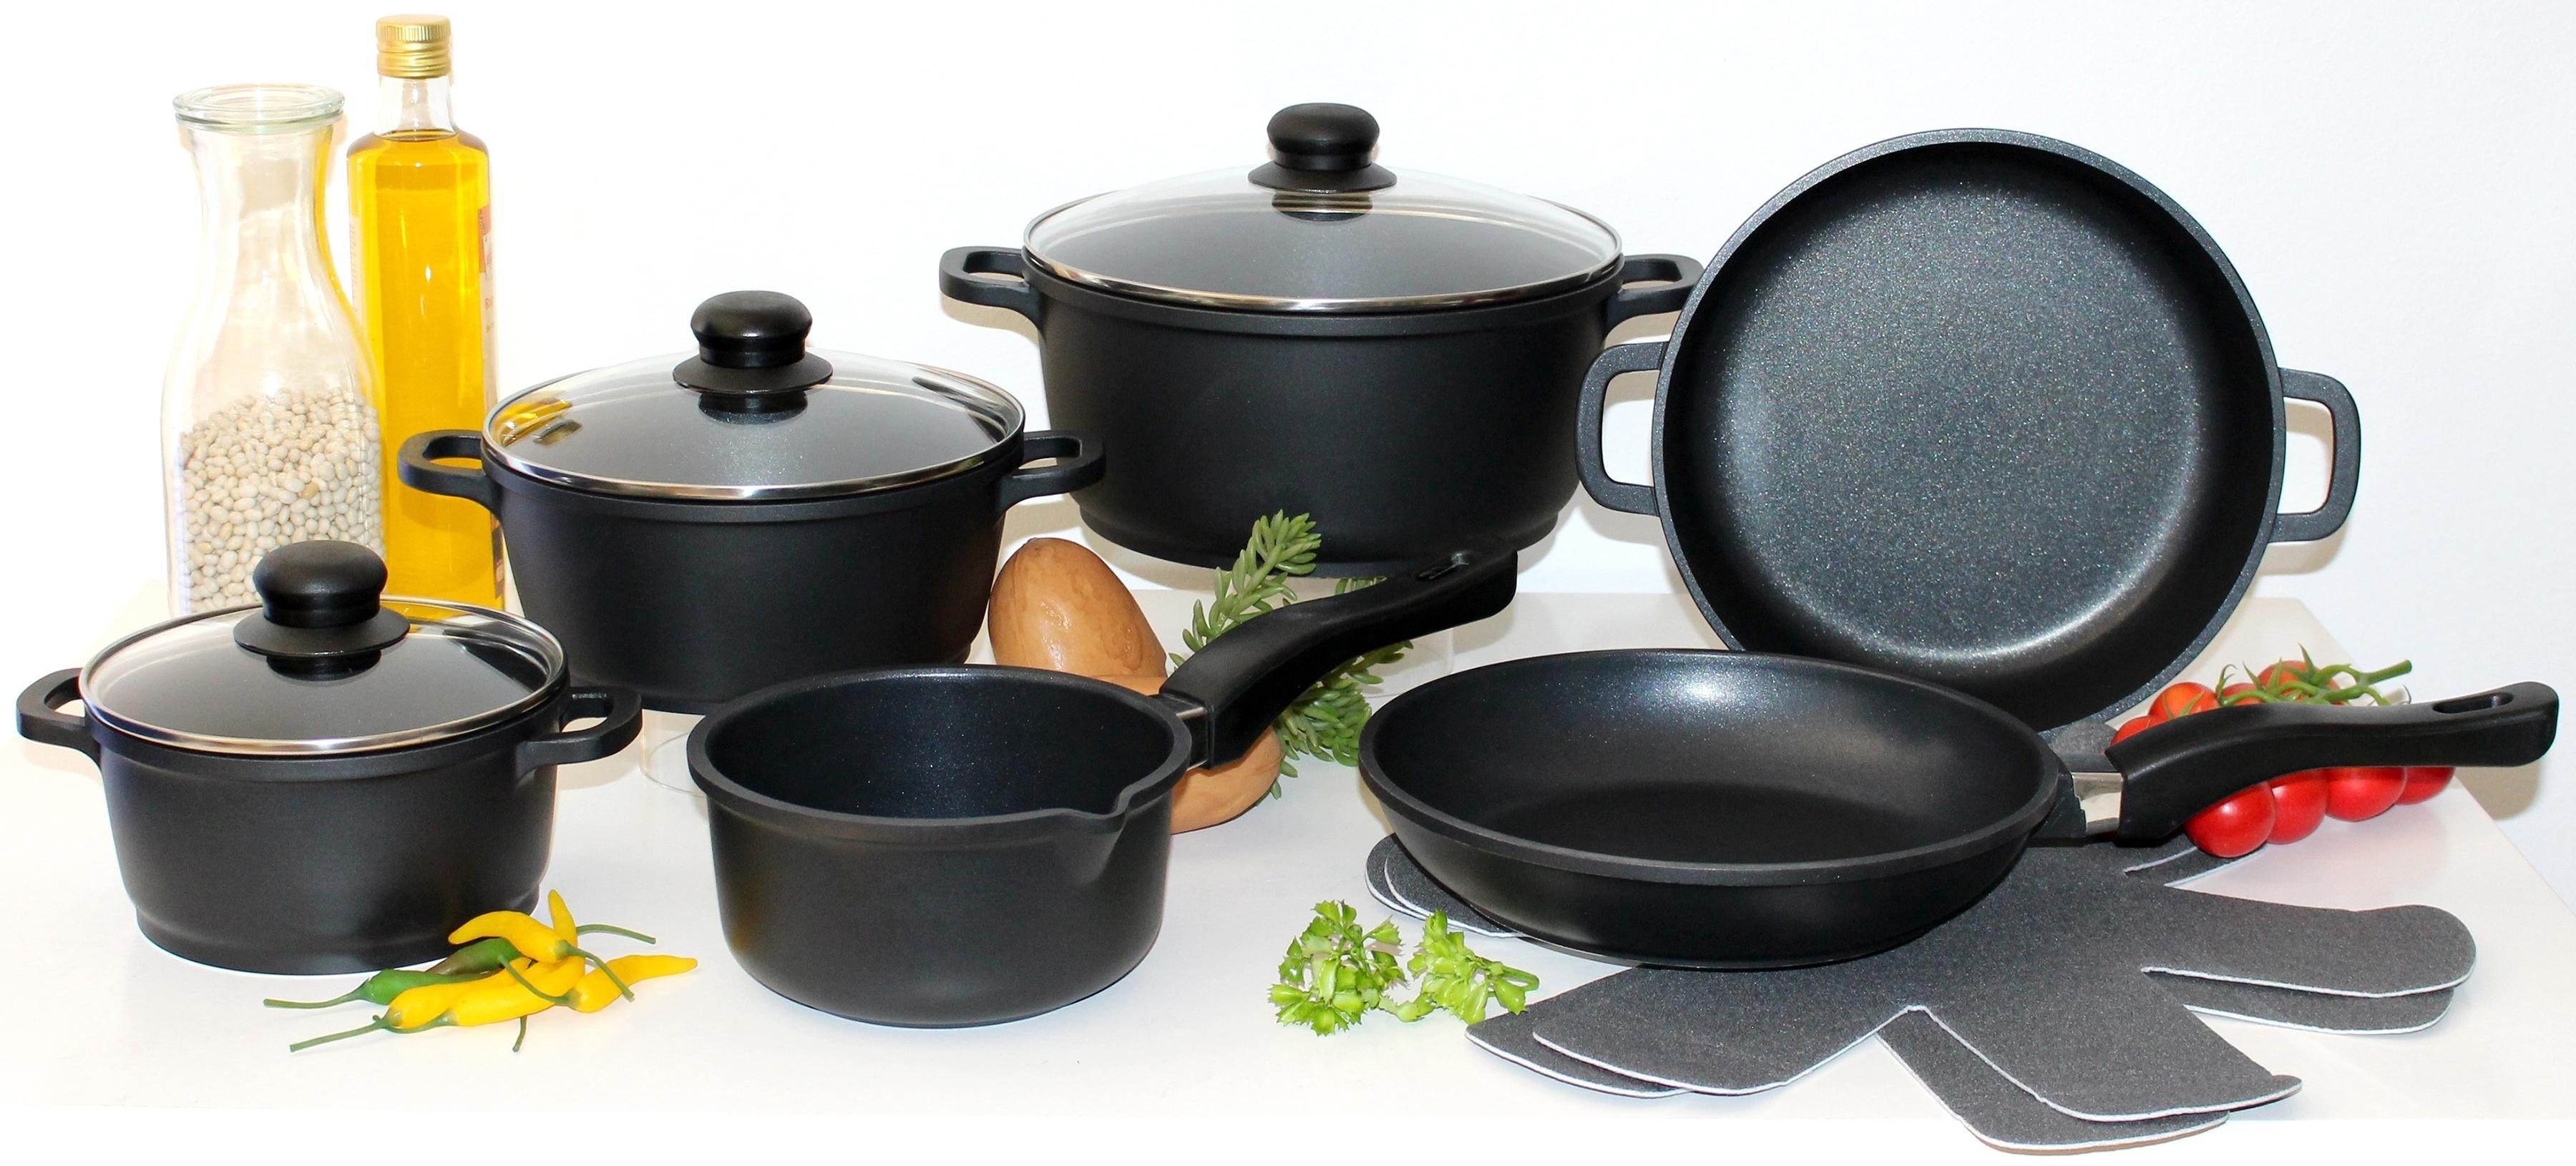 Elo - Meine Küche pannenset (10-dlg.: 4 pannen, 3, deksels, 2 koekenpannen, 1 paar panbeschermers) veilig op otto.nl kopen